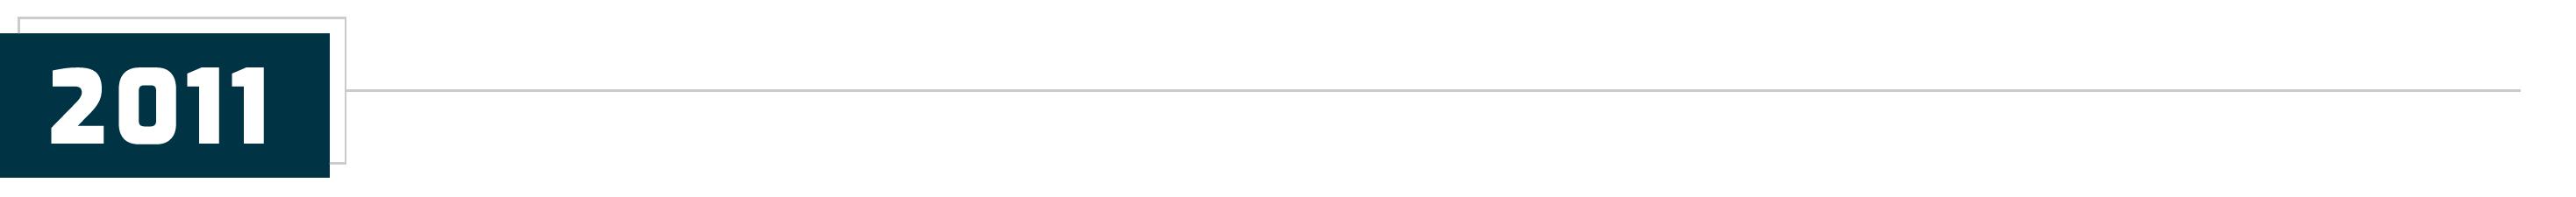 Choice Bank Timeline 2011